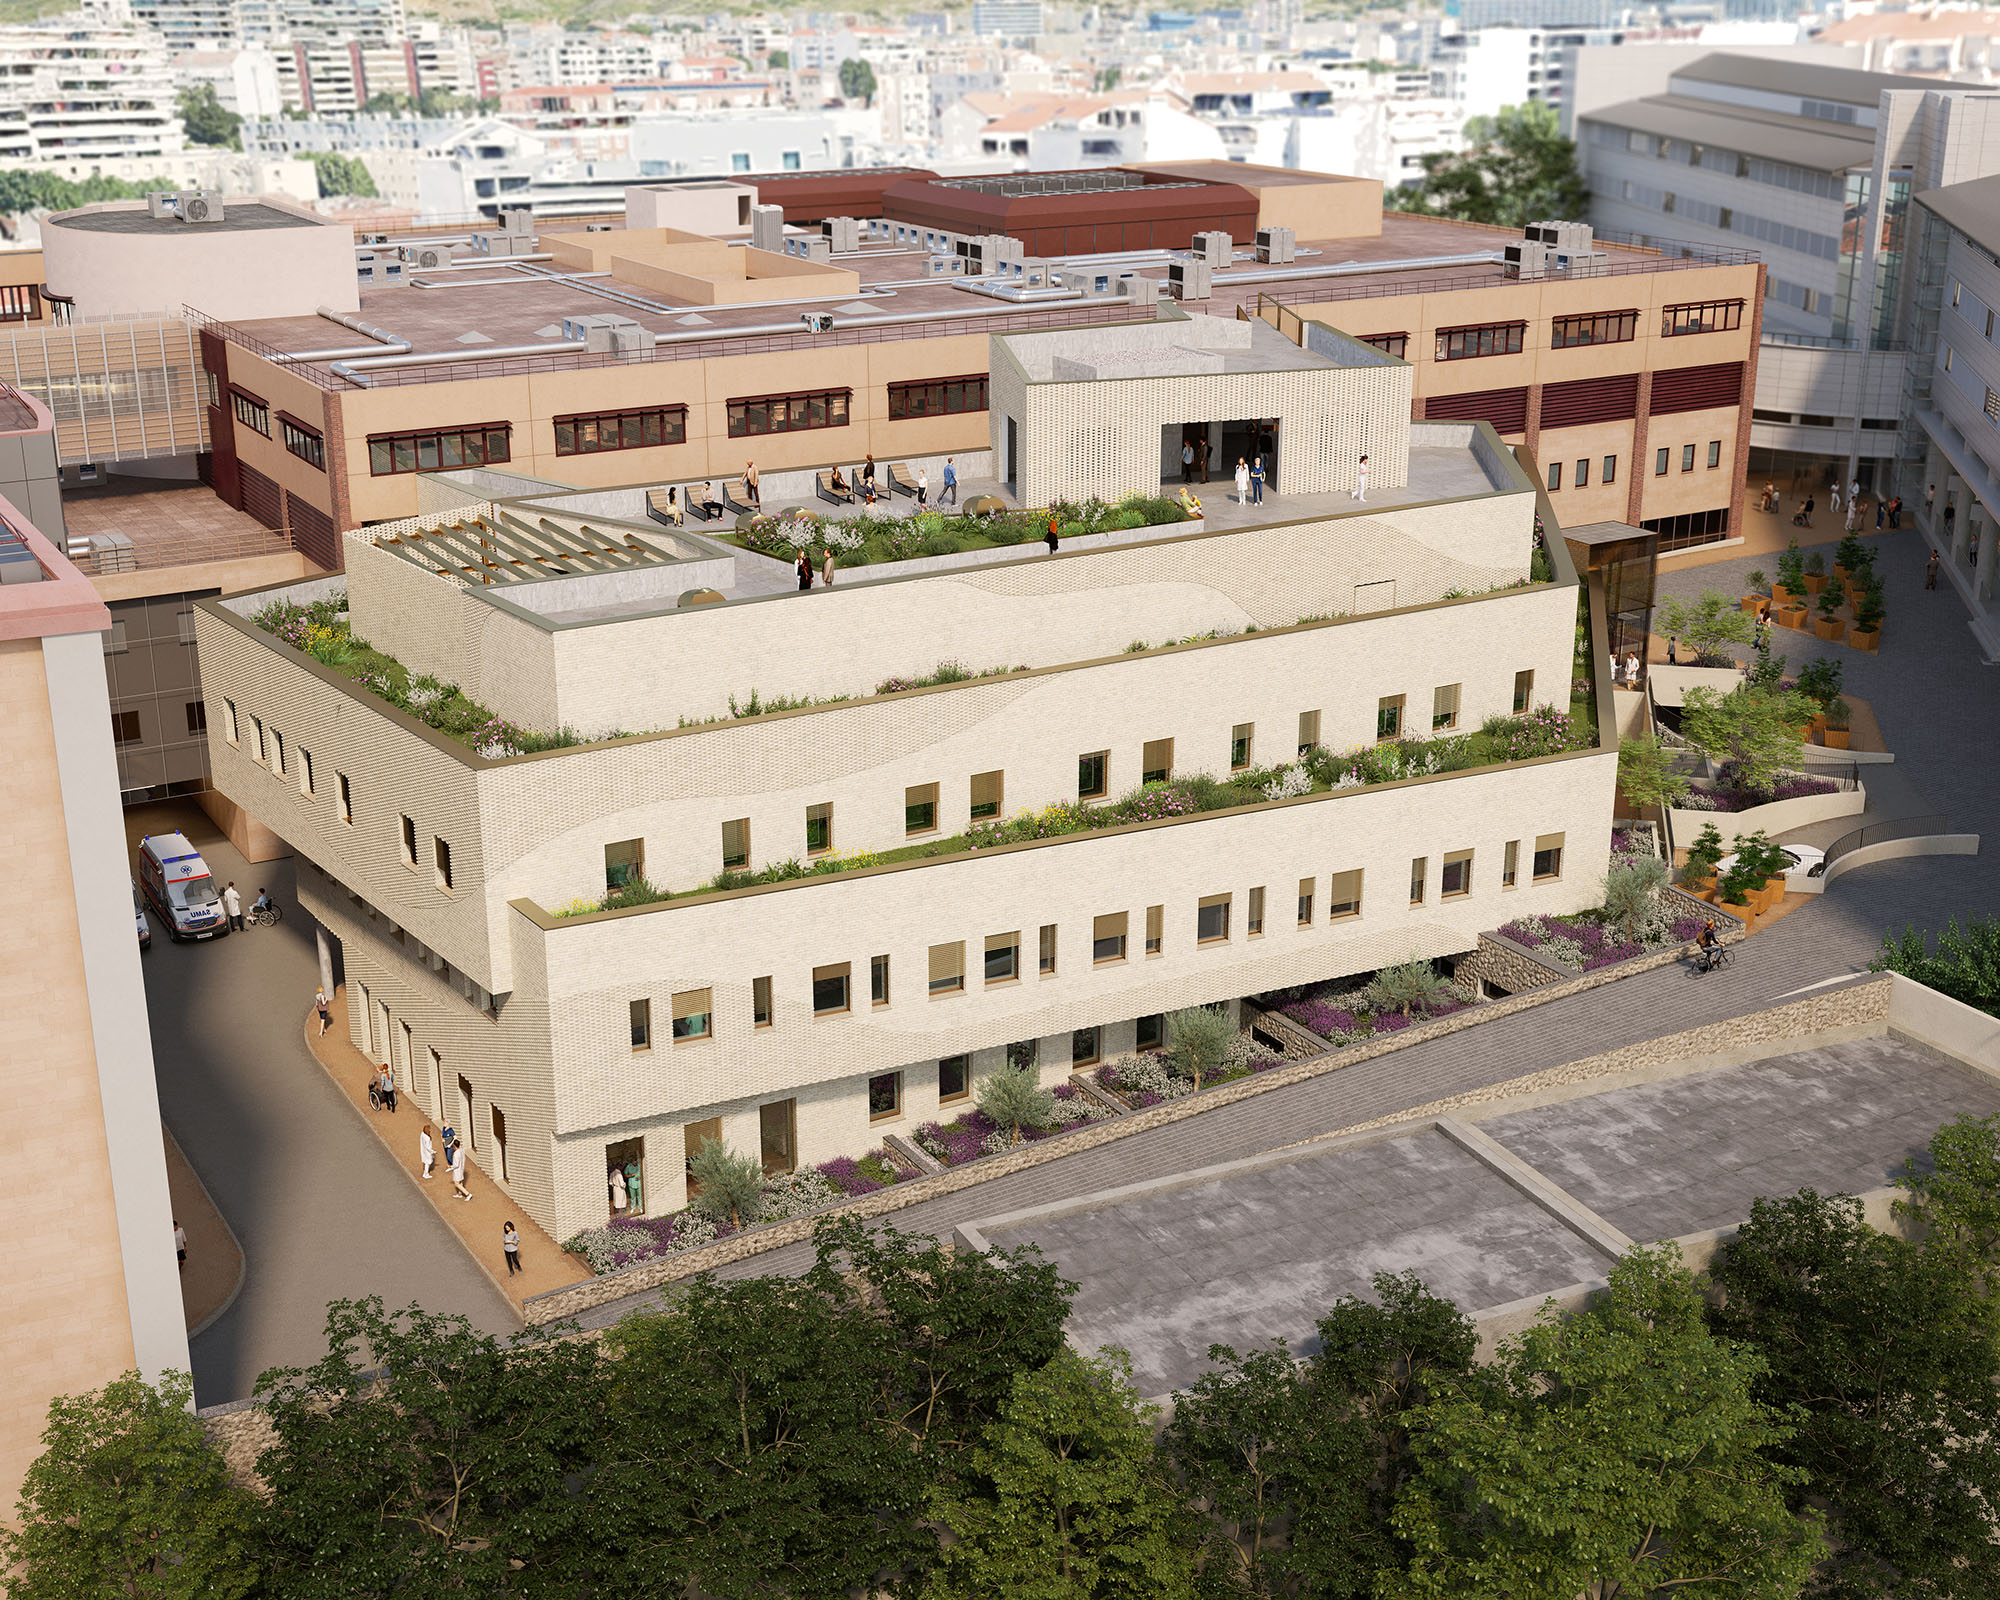 Hôpital Saint Joseph